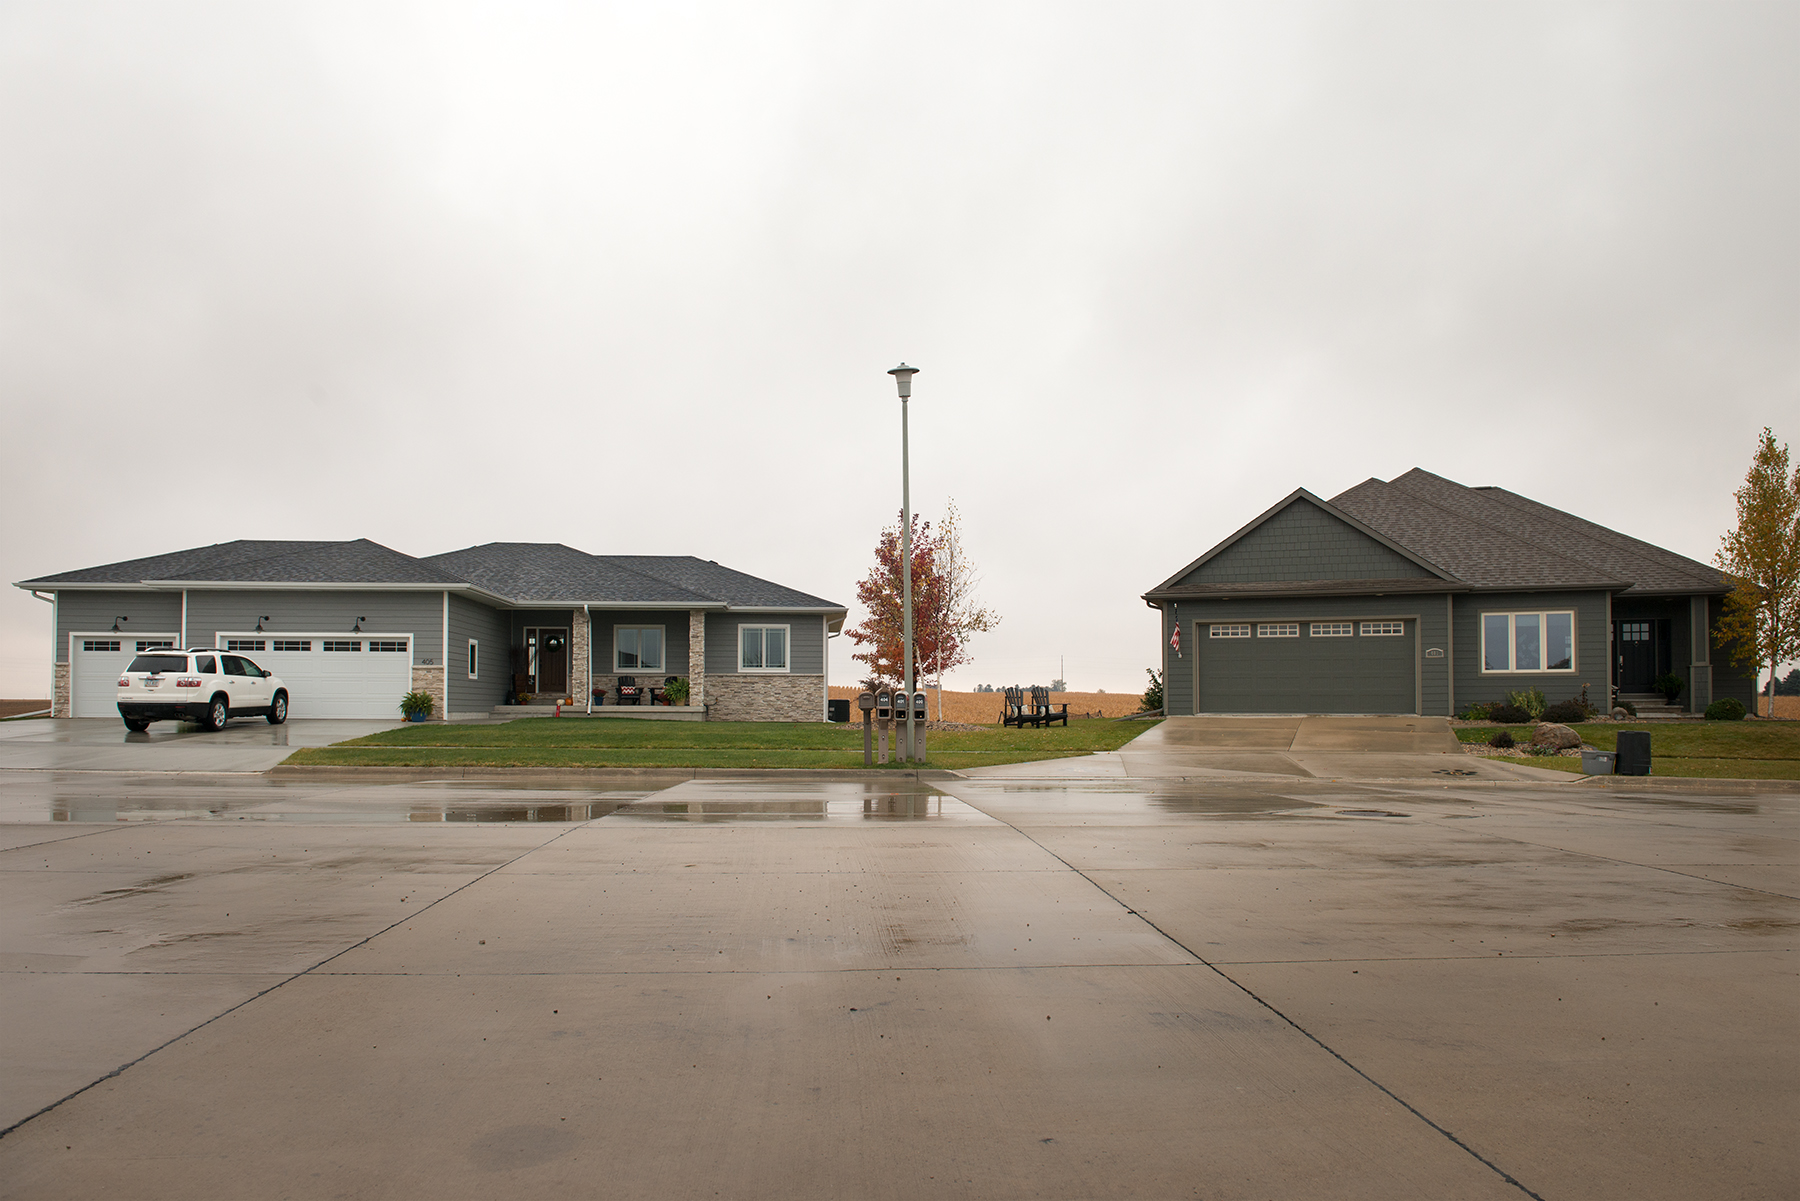 Development near Clear Lake, 2015